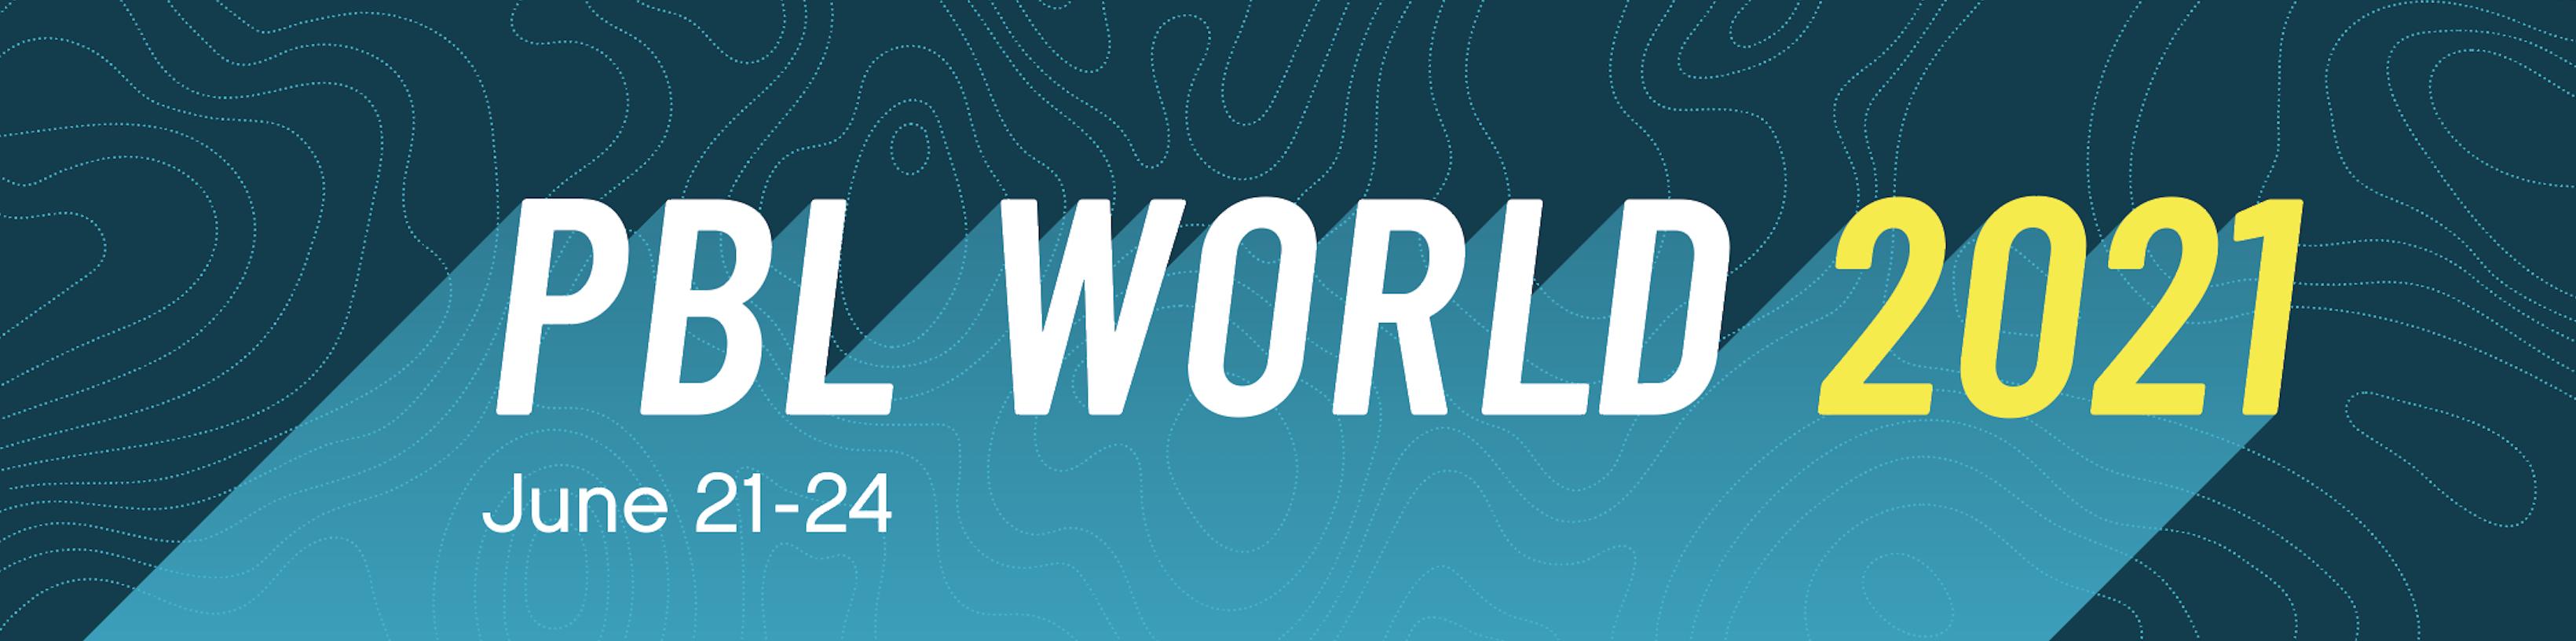 PBL World 2021 - June 21-24